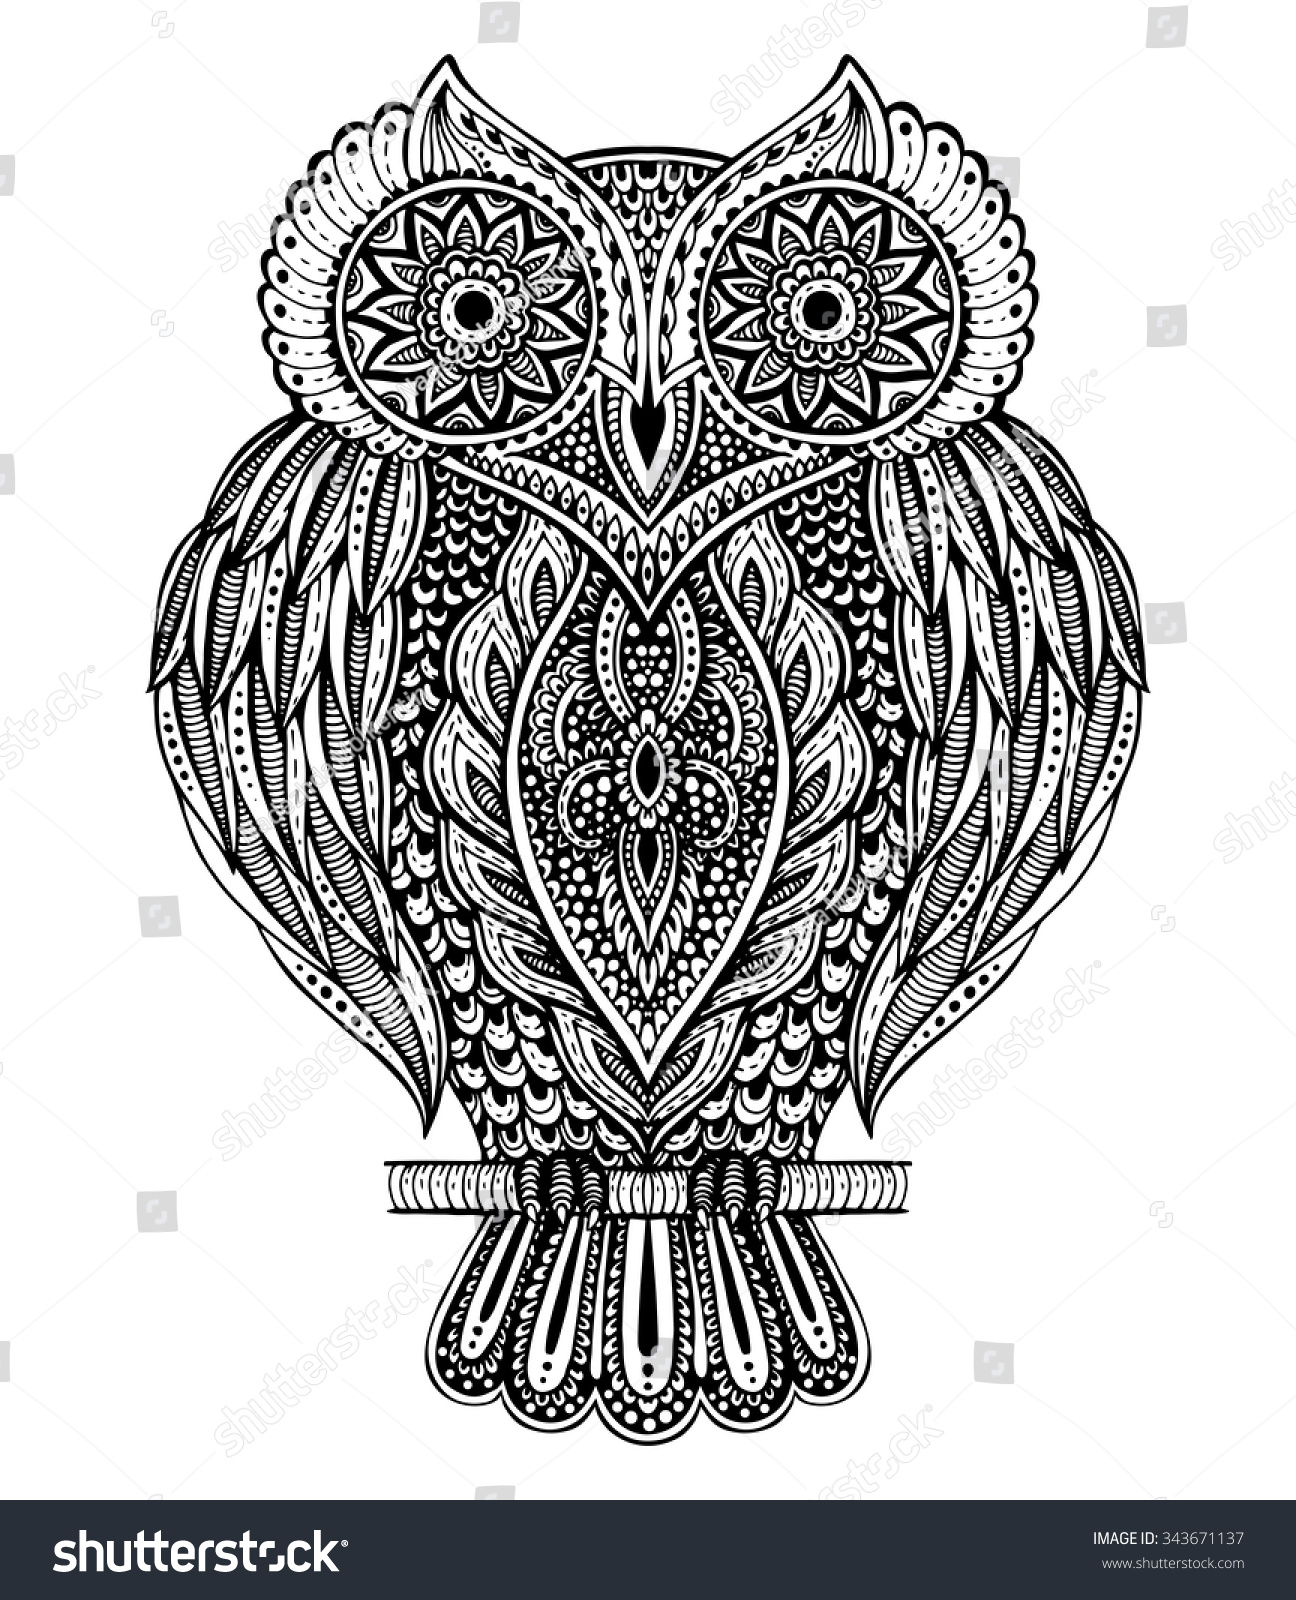 black white vector hand drawn ornate stock vector 343671137